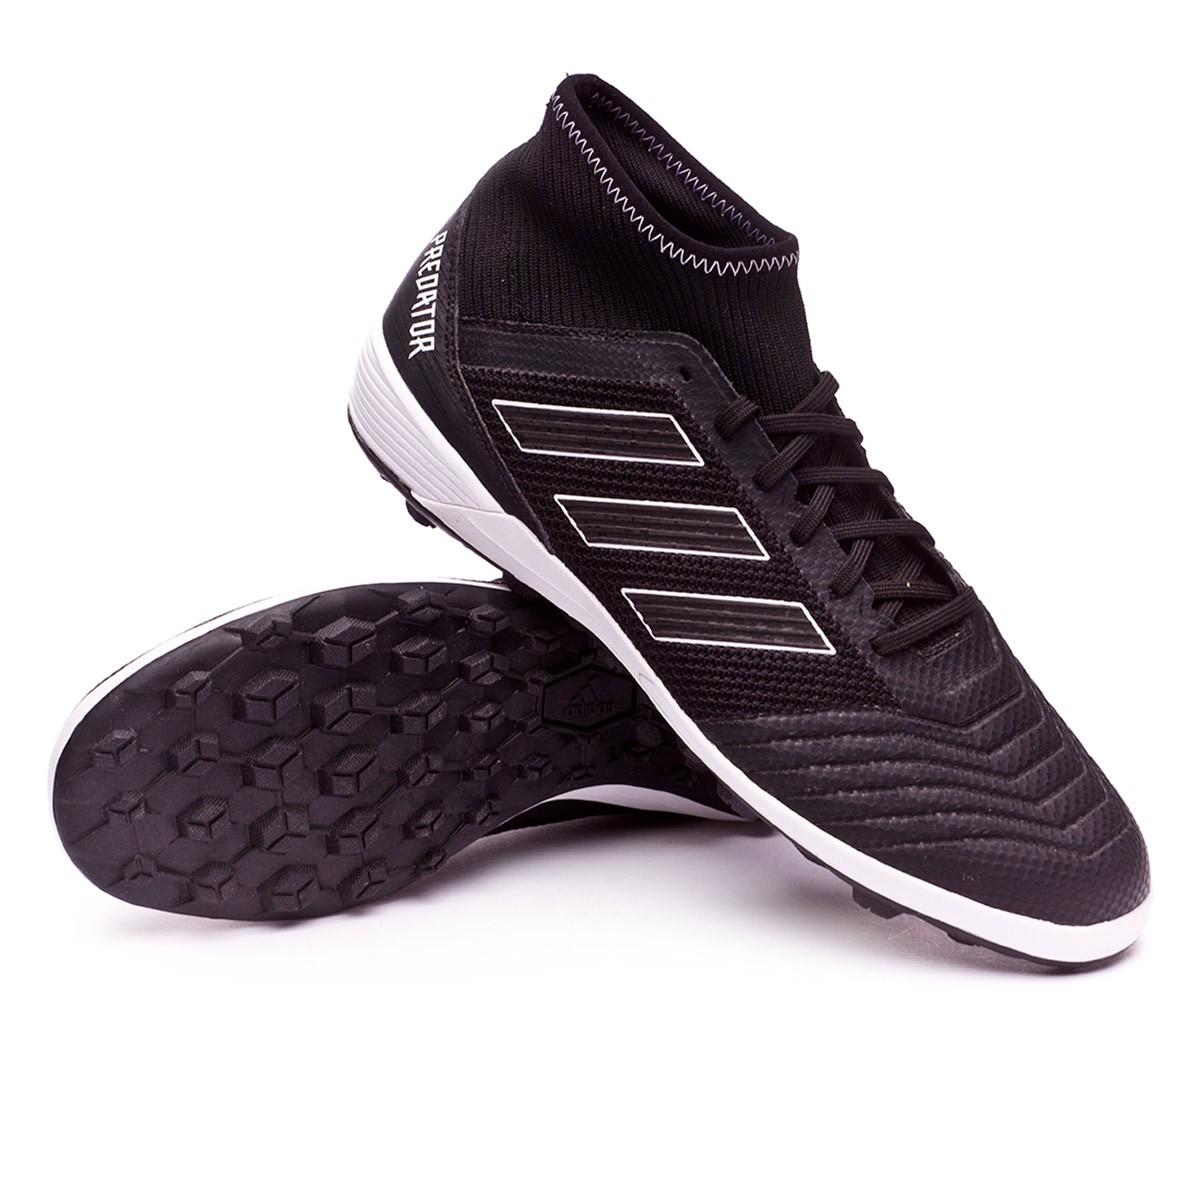 ffe92e4758970 Football Boot adidas Predator Tango 18.3 Turf Core black-White ...